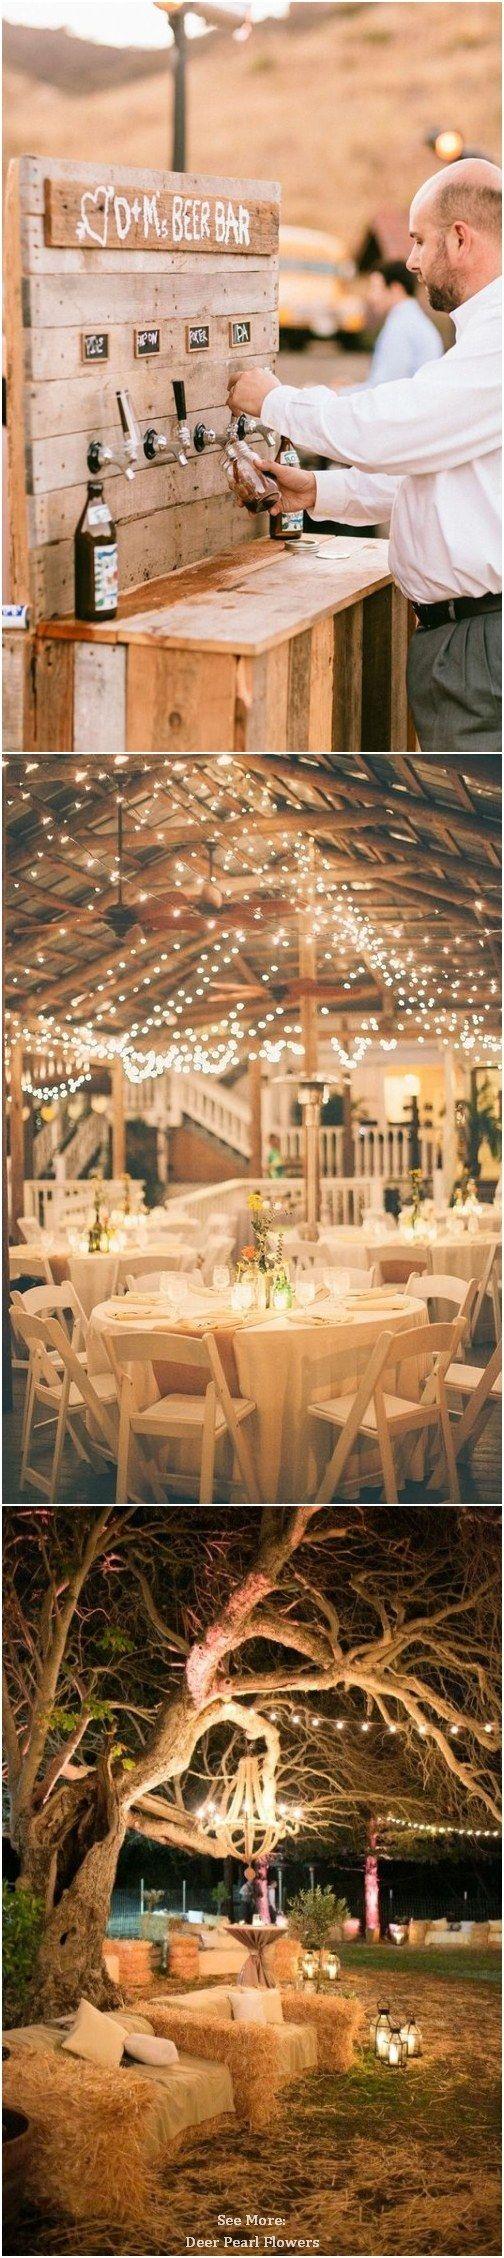 best wedding ideas images on pinterest wedding ideas weddings